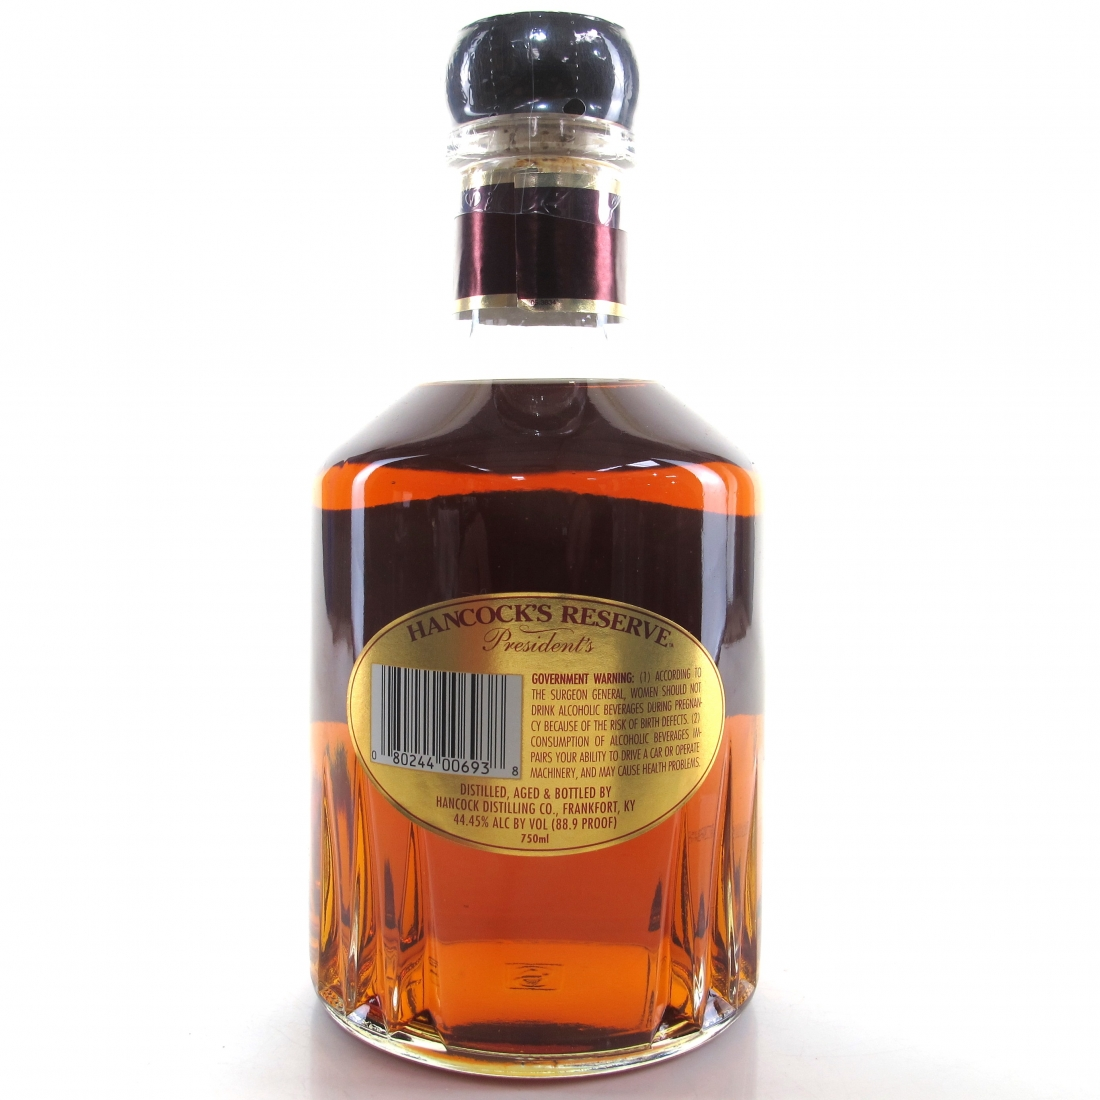 Hancock's President's Reserve Single Barrel Bourbon